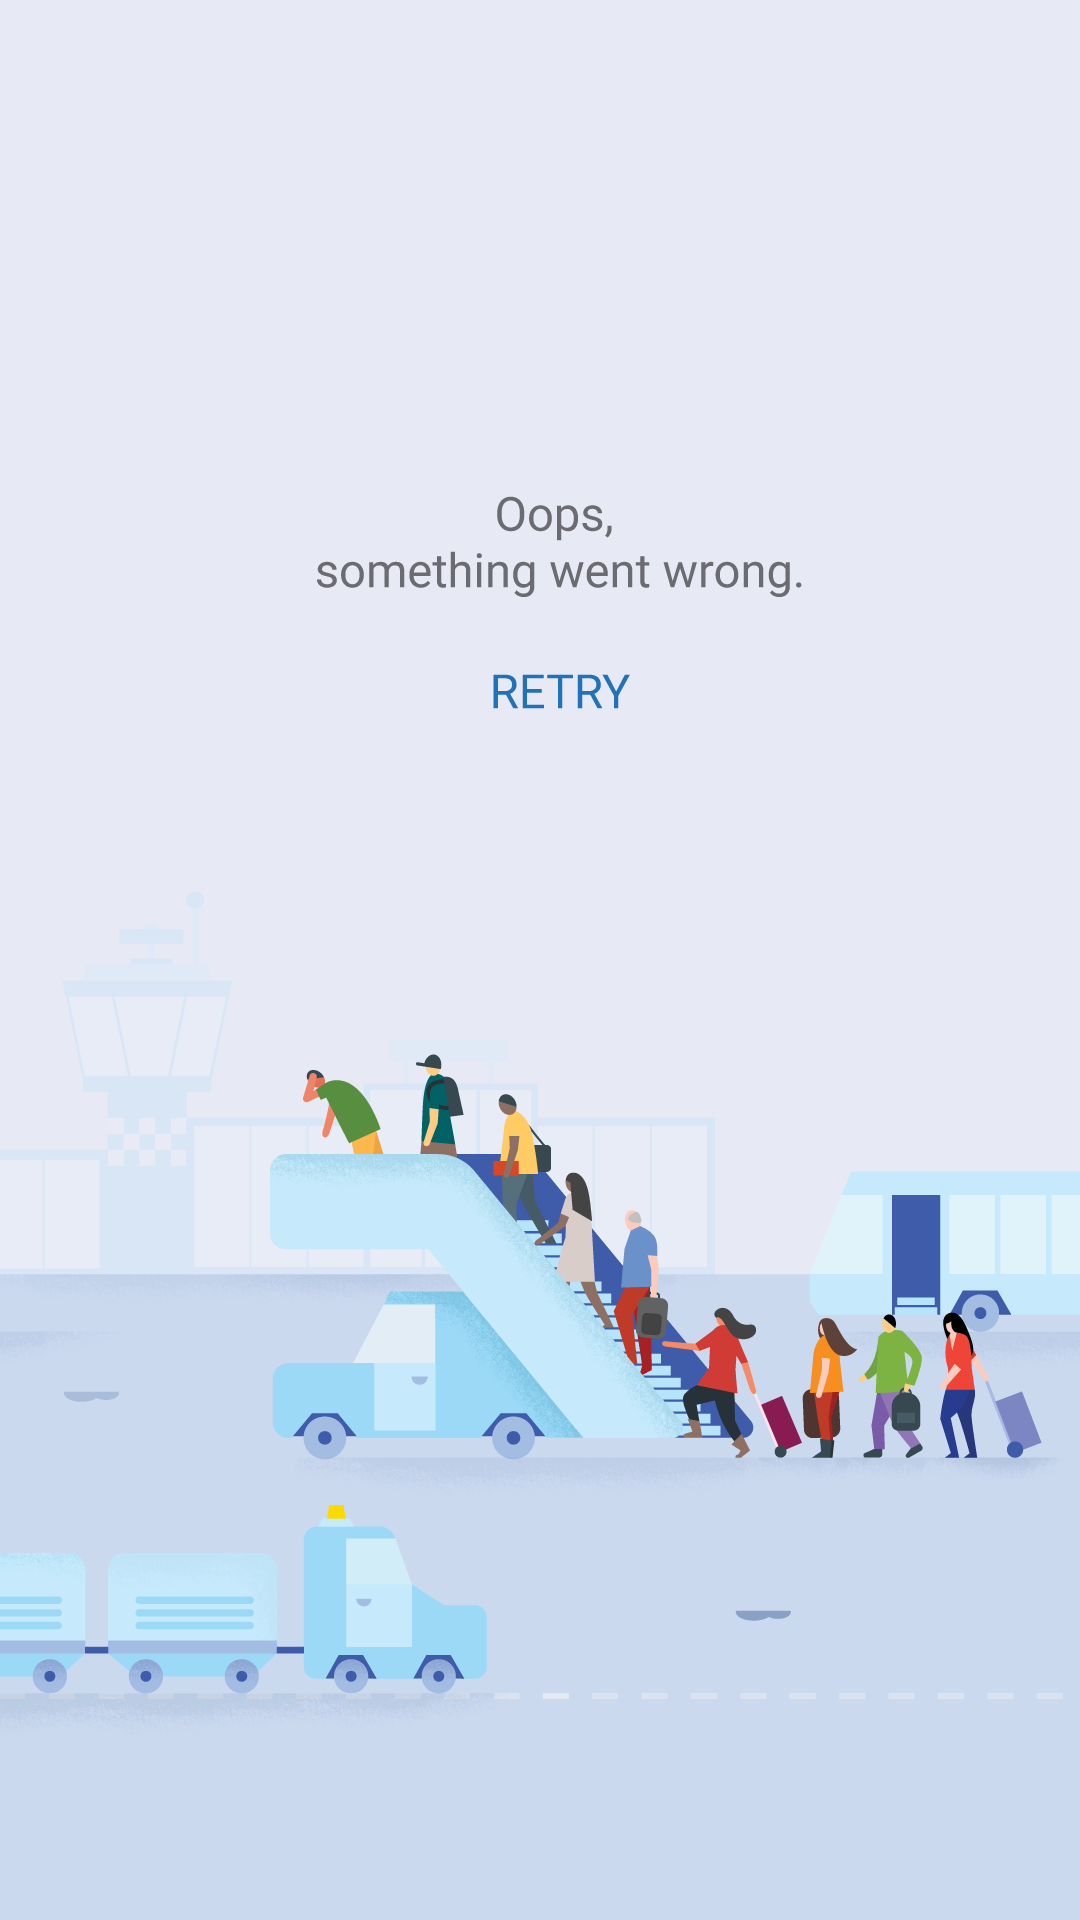 Flights error illustration portrait